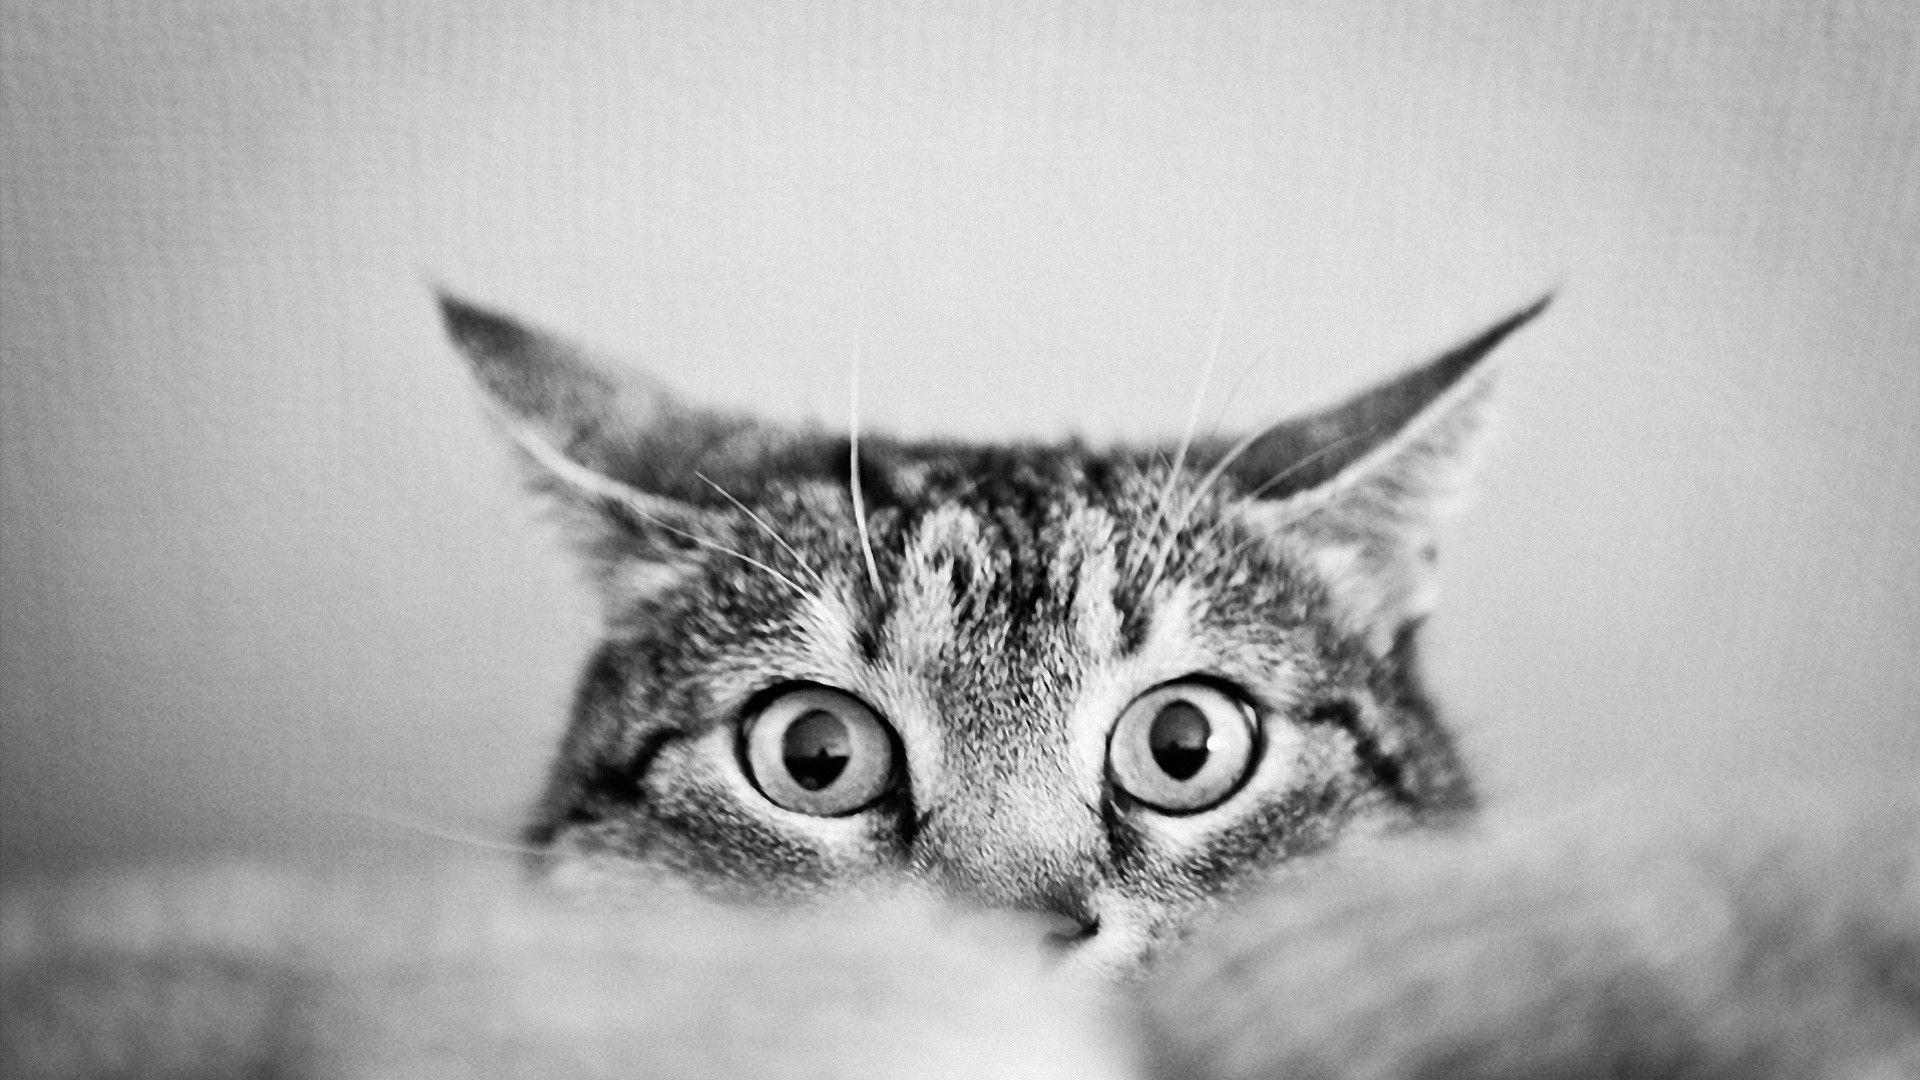 cats desktops wallpapers hd